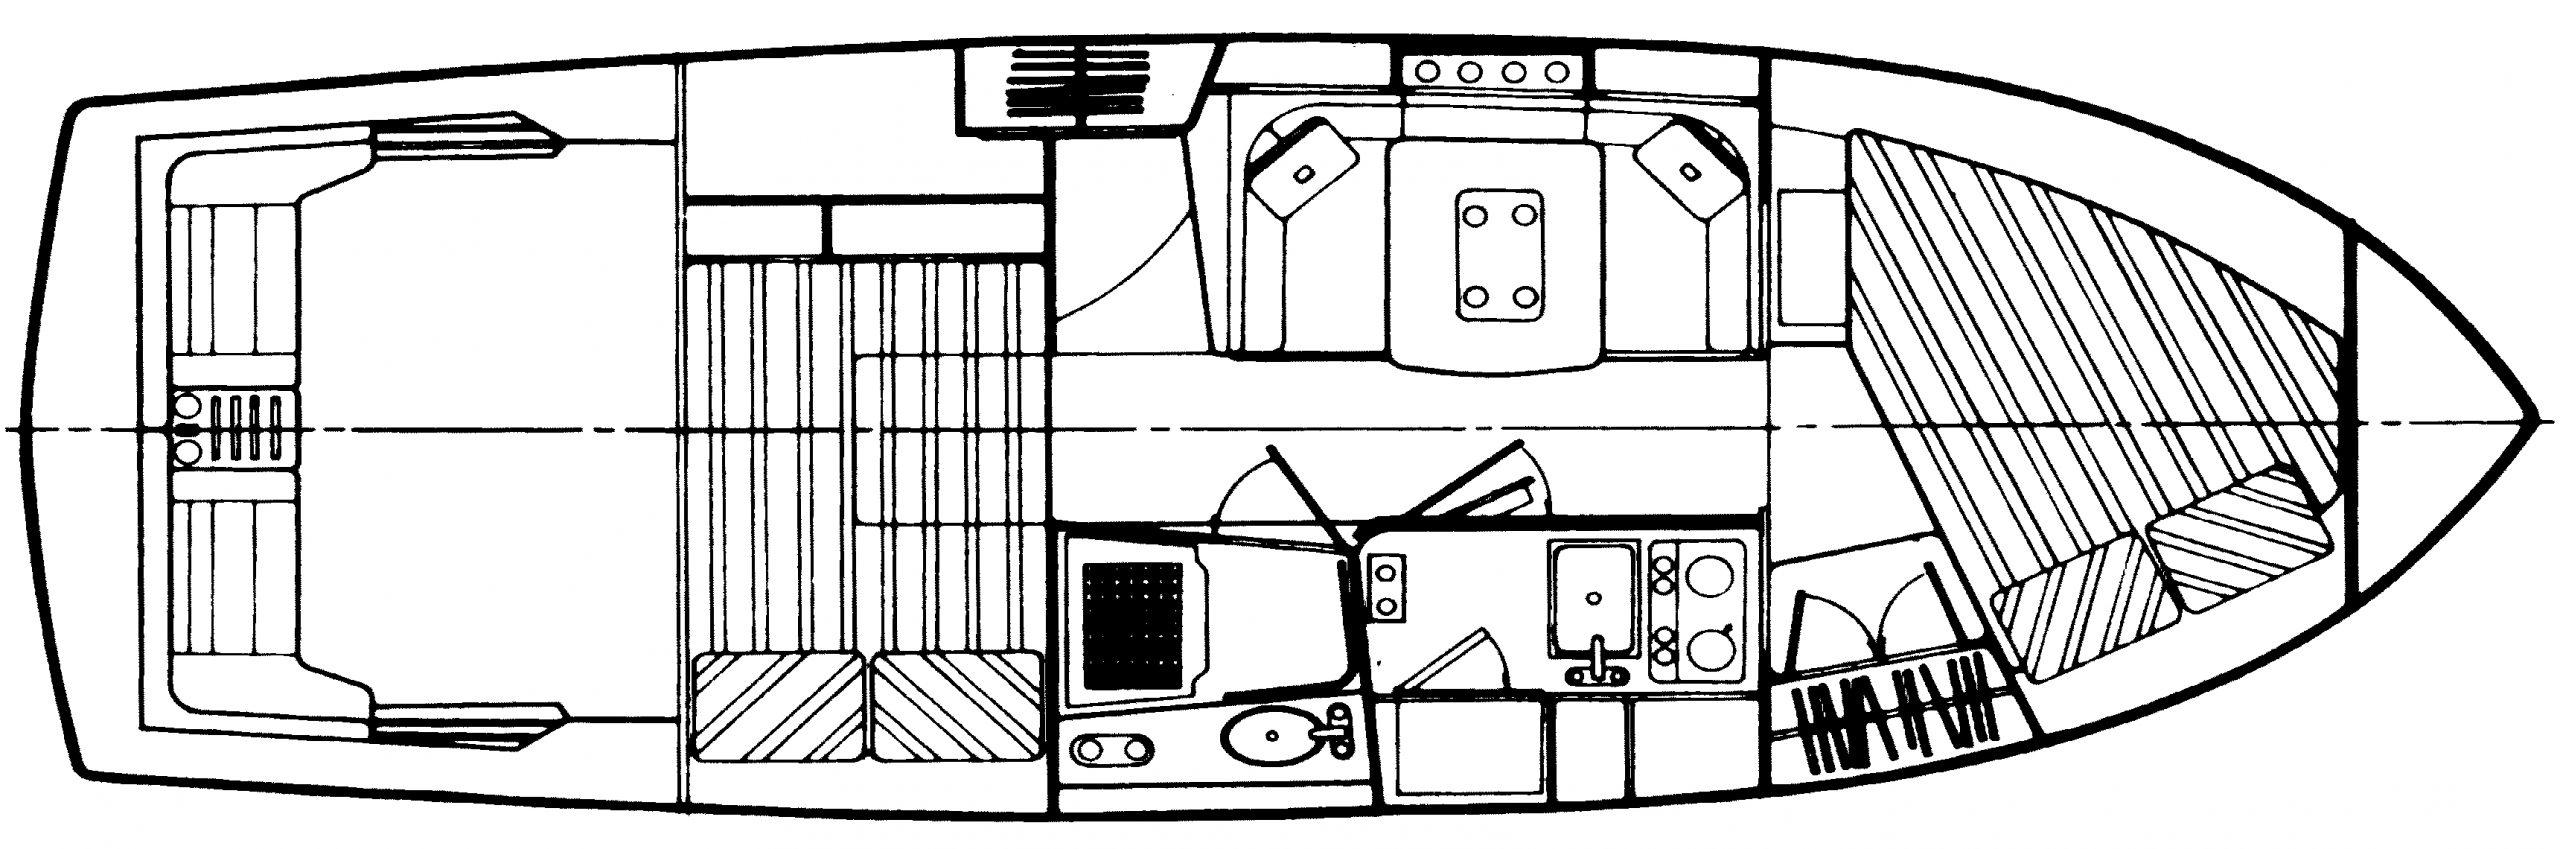 Century 300 Grande Floor Plan 2